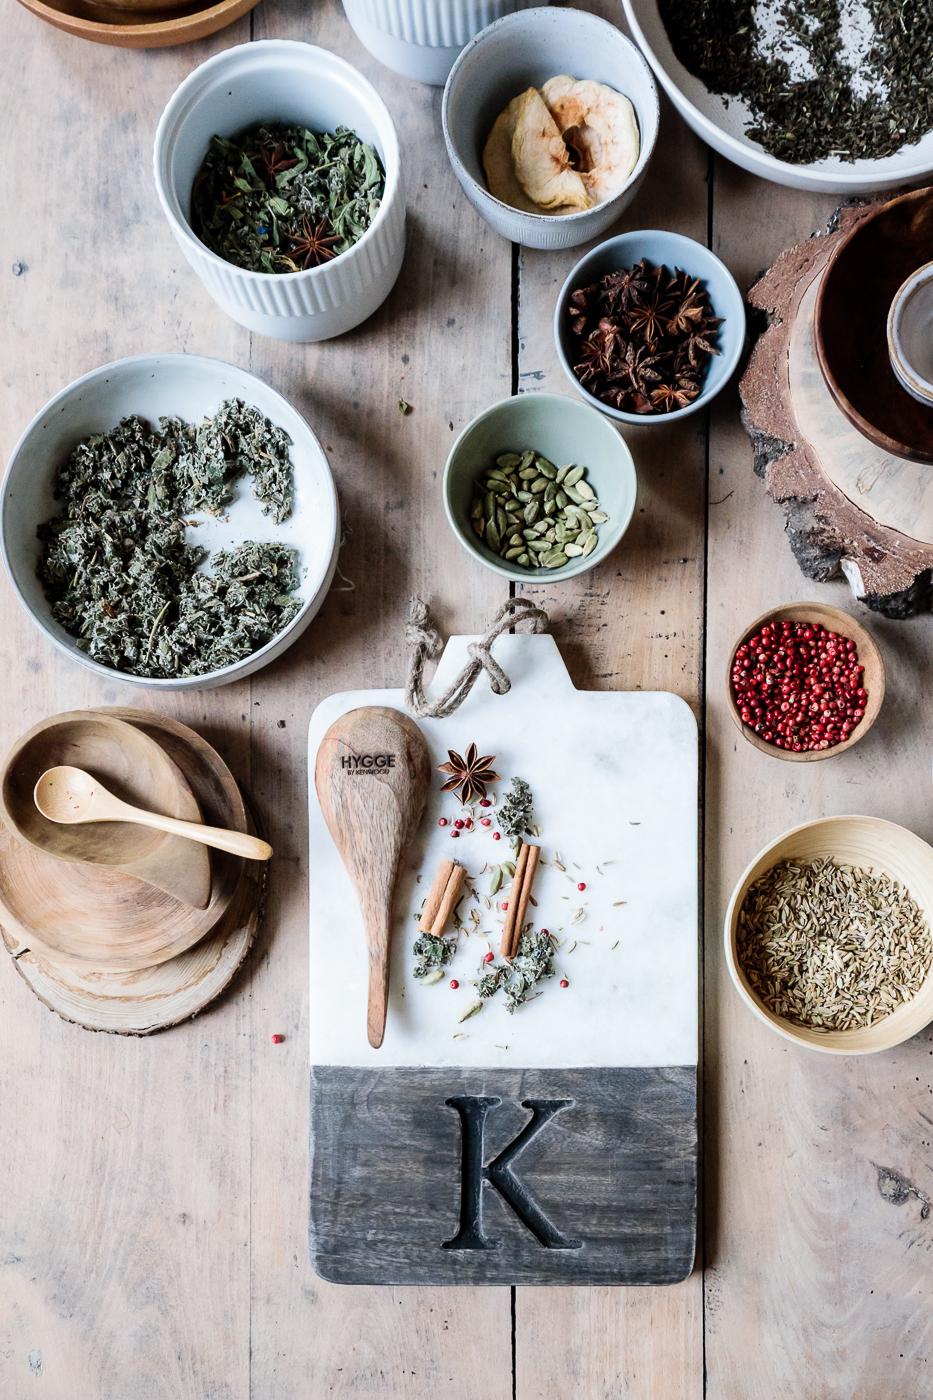 Kenwood Cooking Chef 19_01_2018